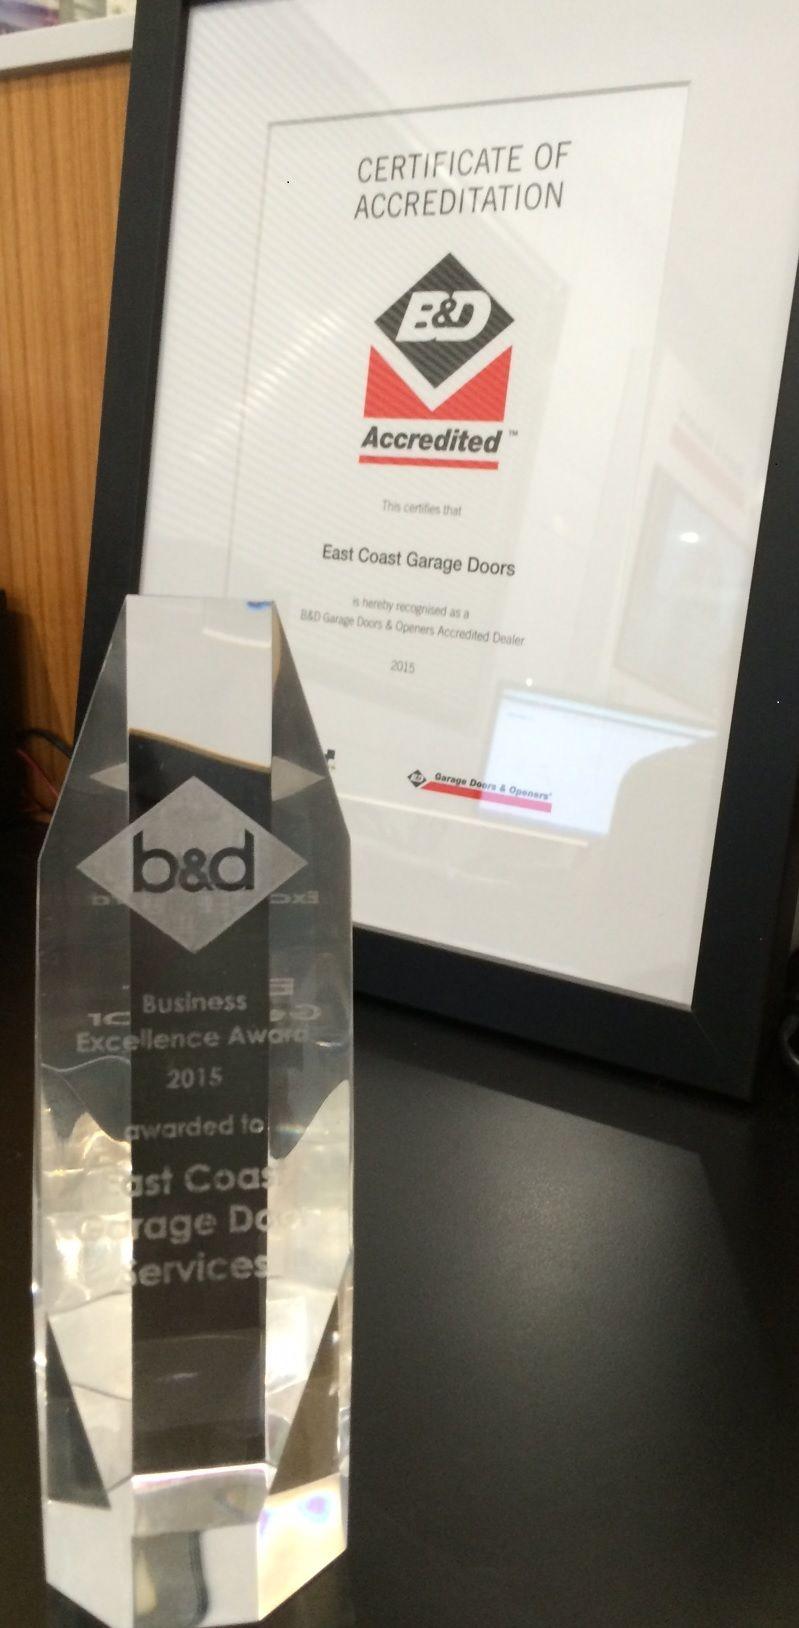 B d accredited dealer award won by east coast garage doors for Idea accredited door dealer